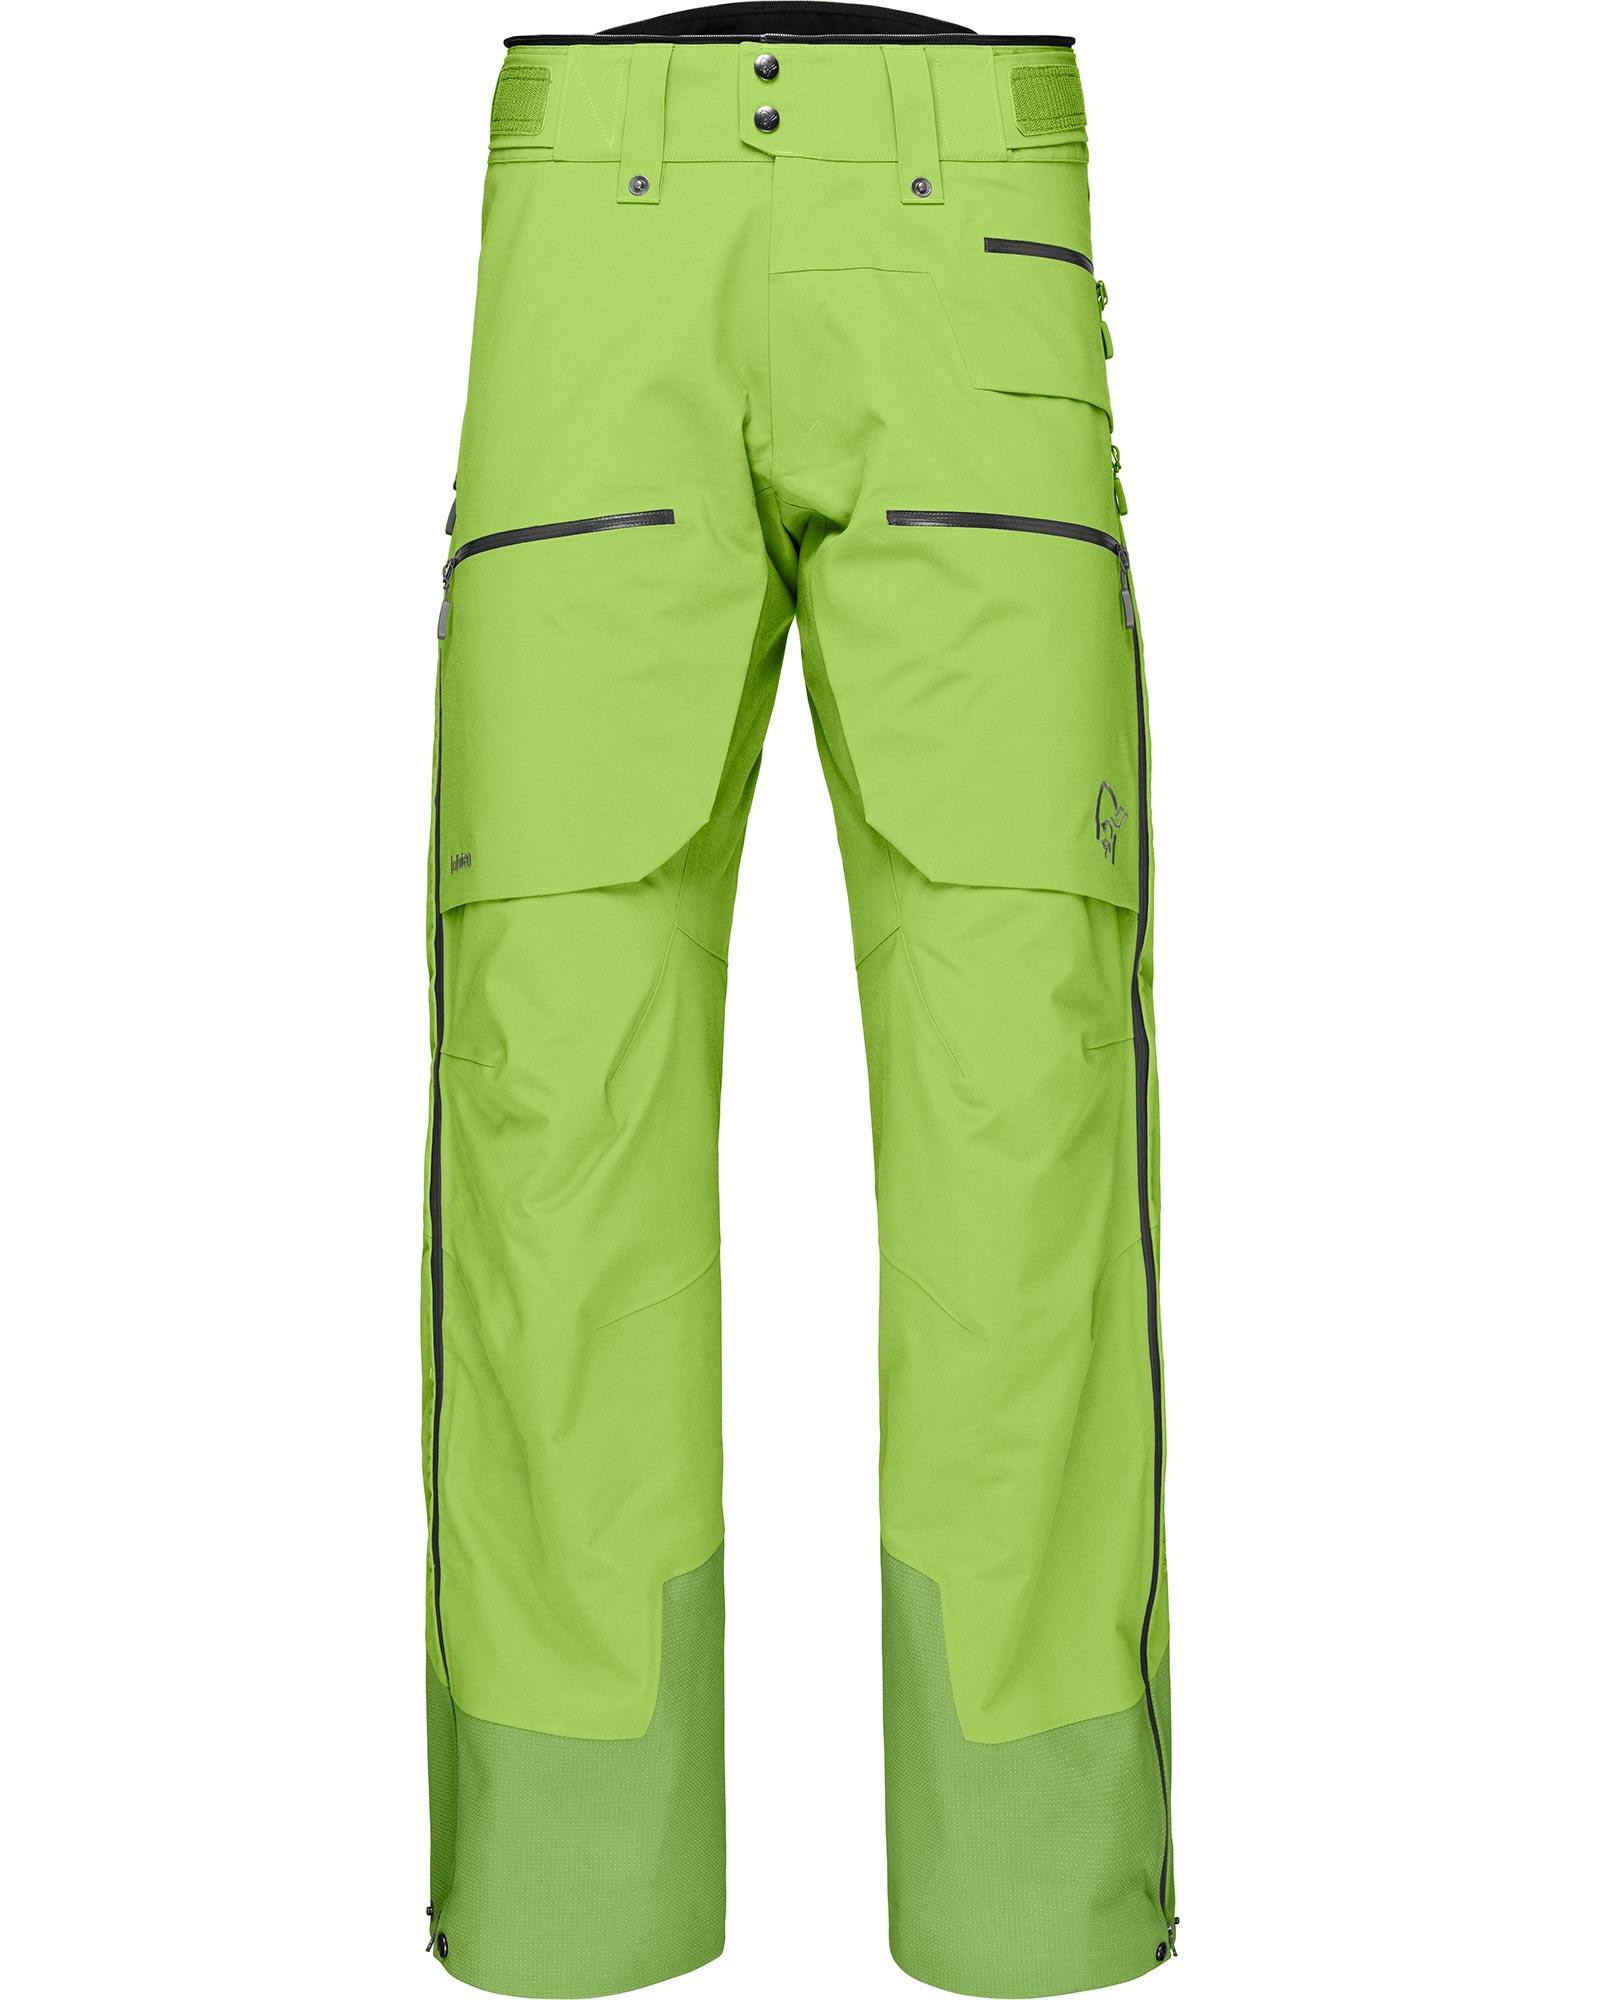 Norrona Men's Lofoton GORE-TEX Pro Ski Bib Pants 0